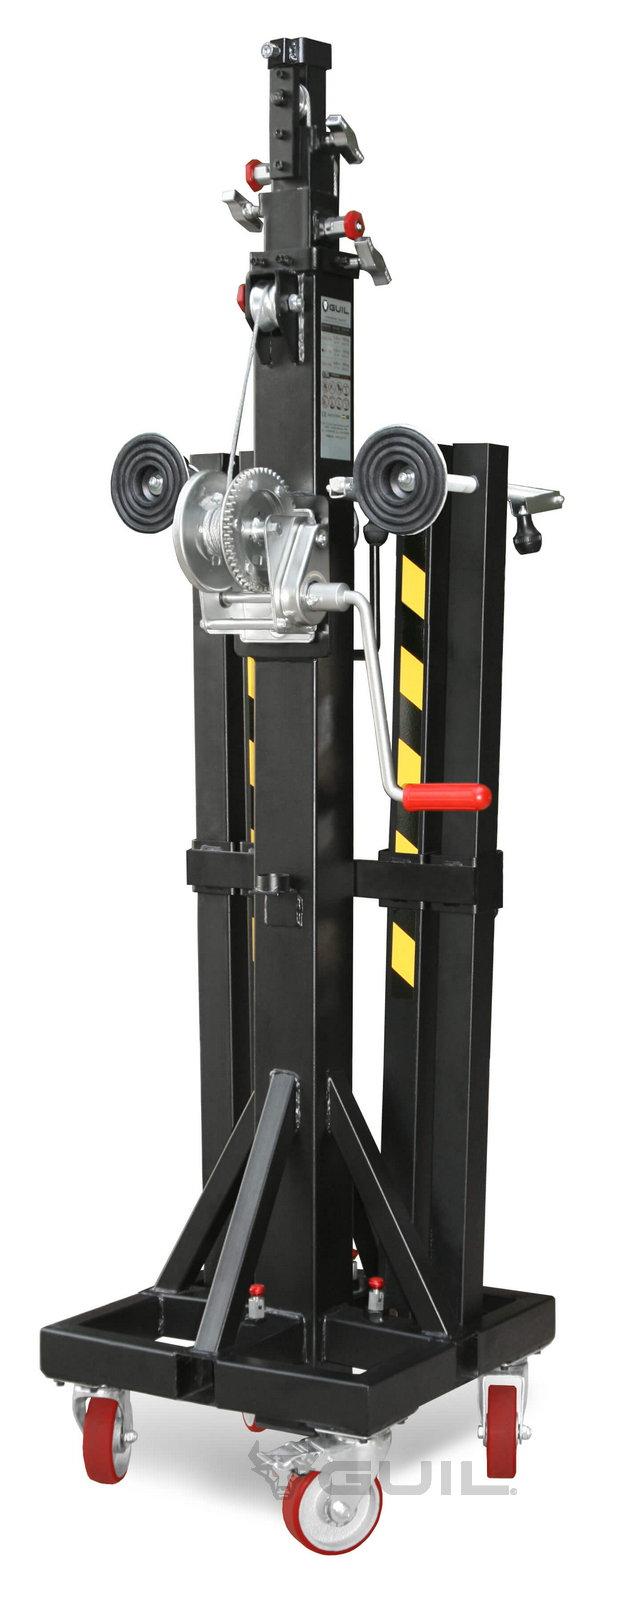 Materiaallift 1,5-4,5 m 150 kg (dutch) (2)